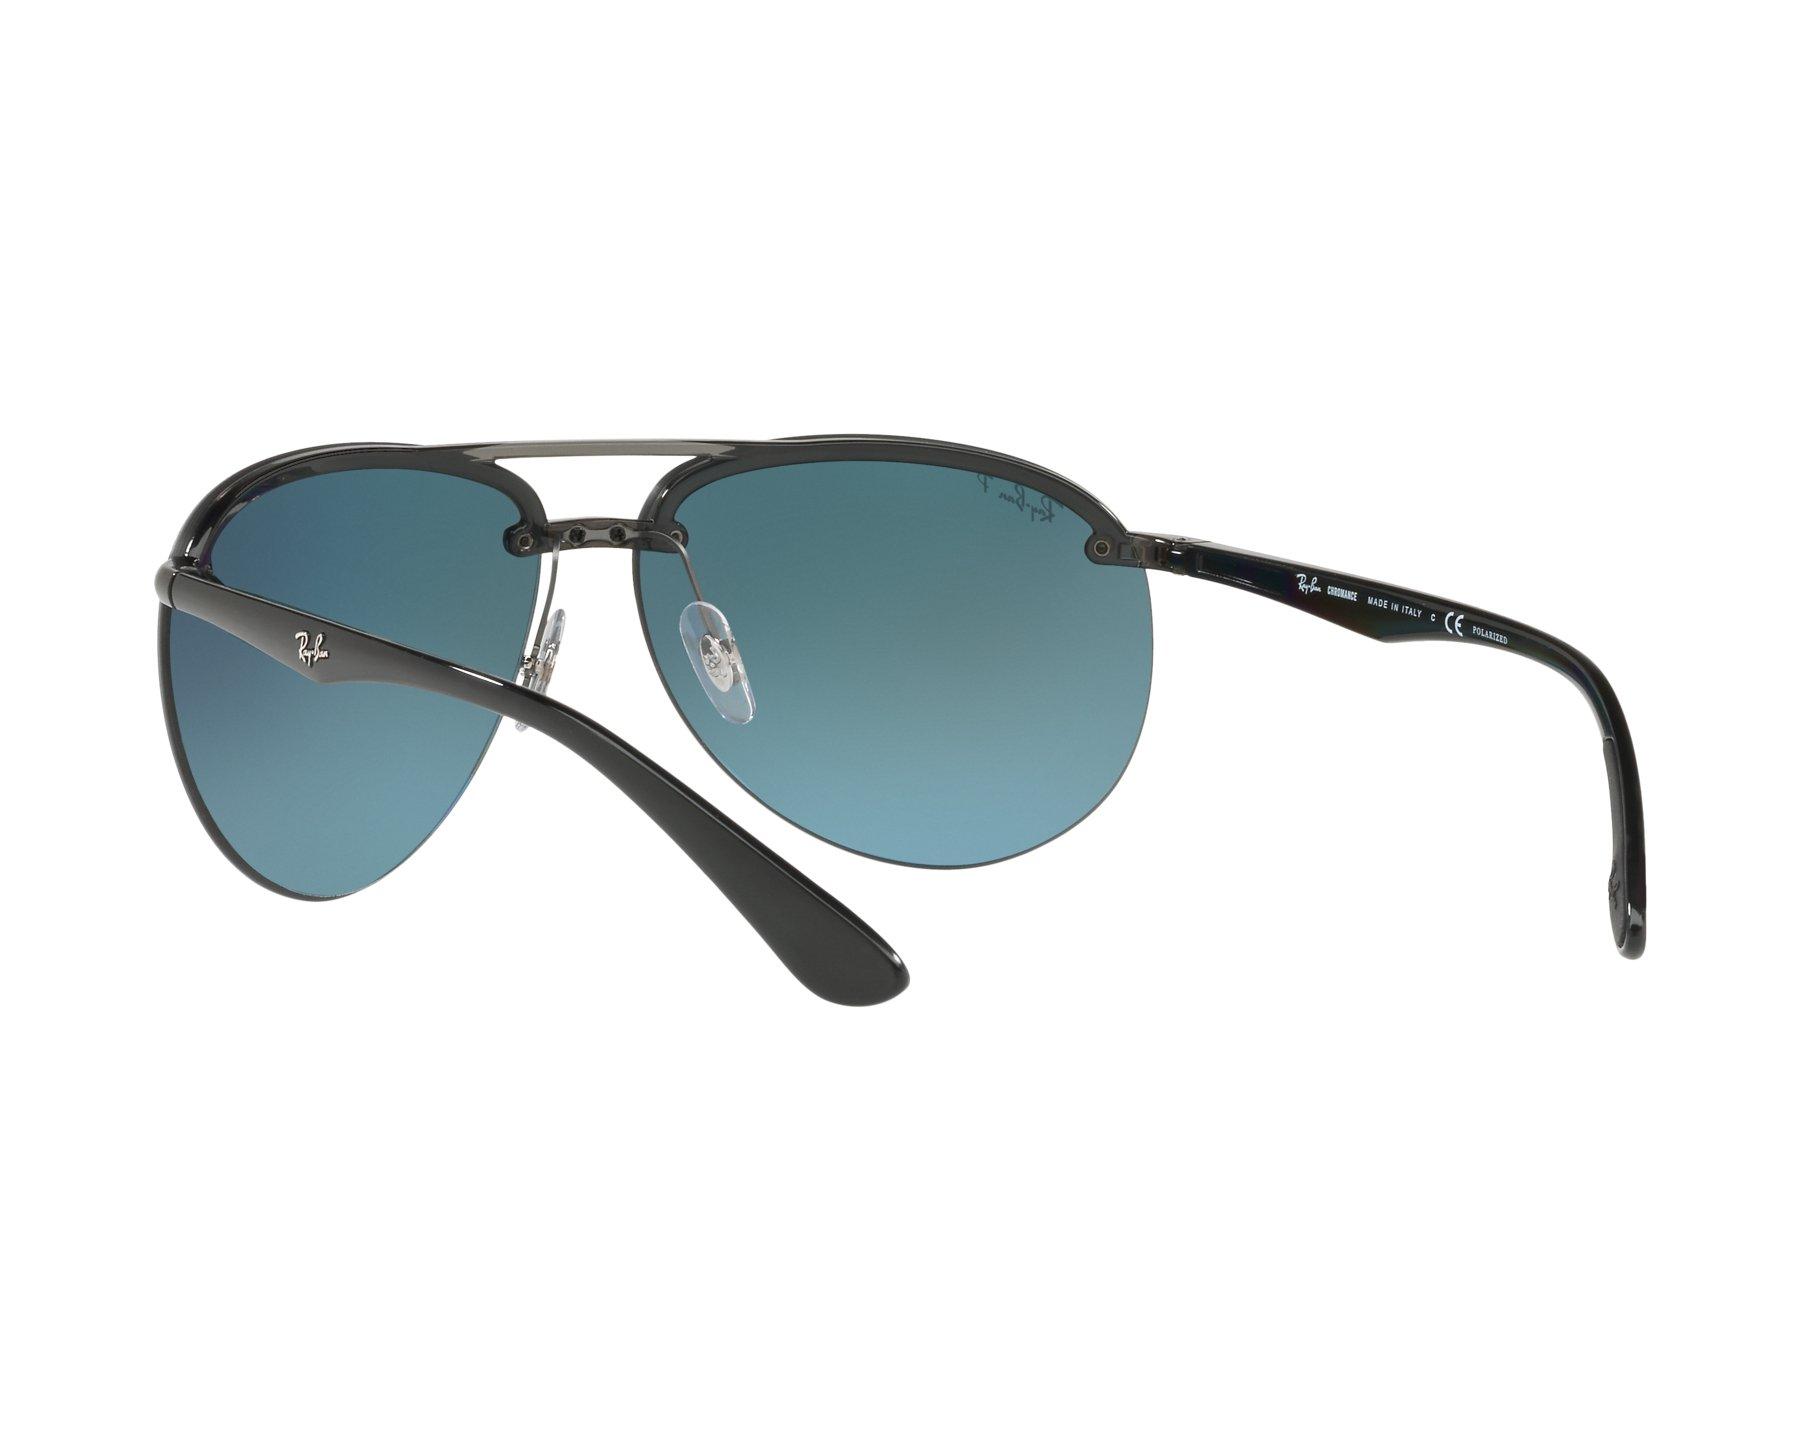 9a57096ba0d Sunglasses Ray-Ban RB-4293-CH 876 J0 - Grey Black 360